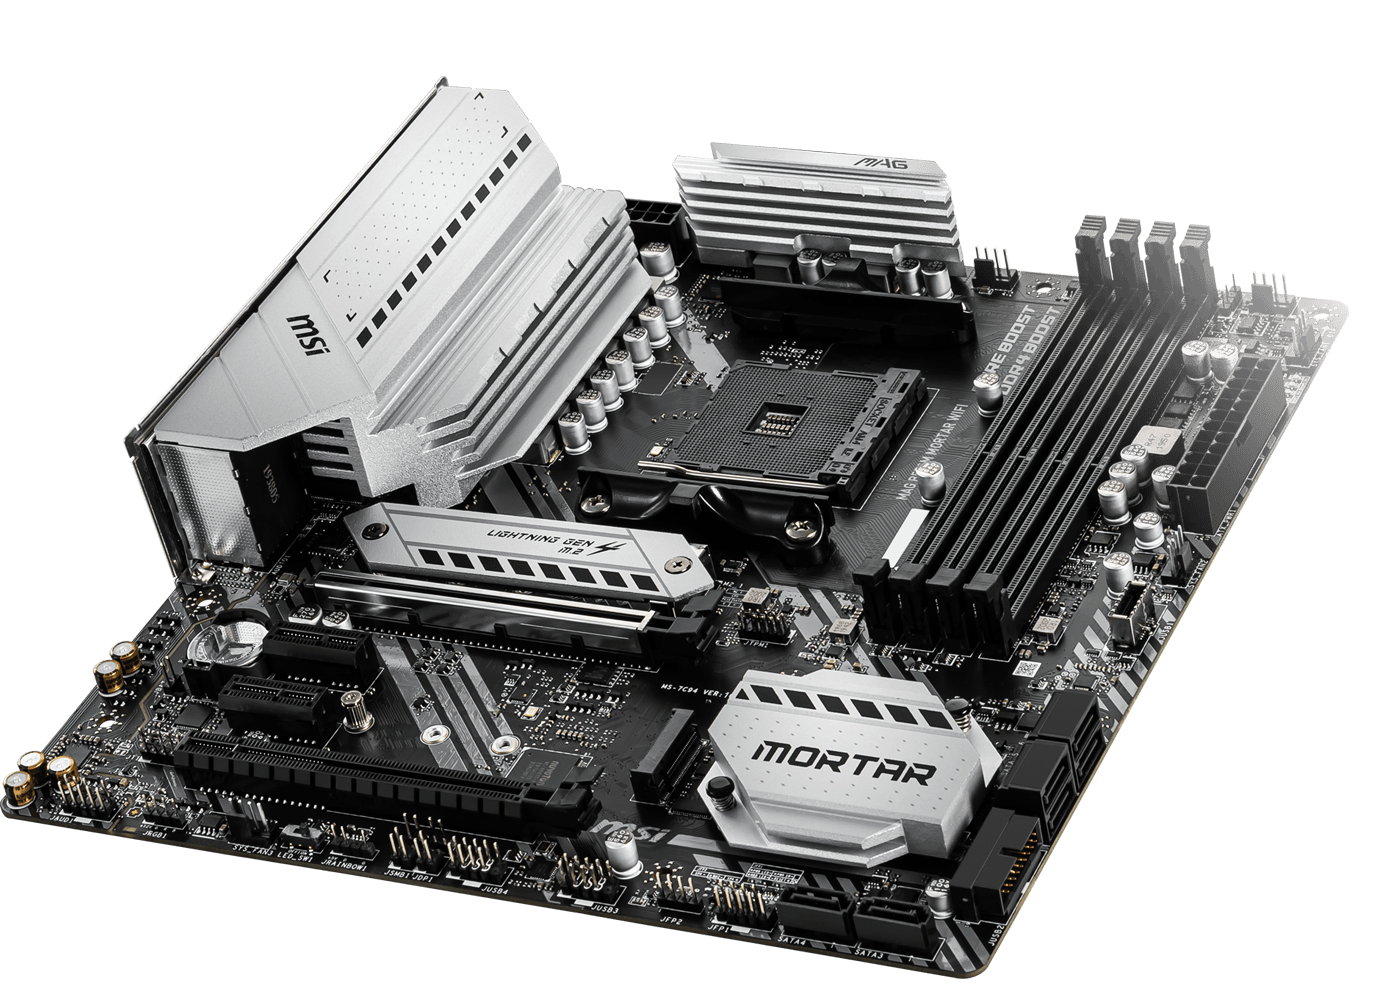 MSI MAG B550M MORTAR WIFI AMD AM4 DDR4 CF Lightning Gen 4 M.2 USB 3.2 Gen 2  HDMI WiFi6 mATX Gaming Motherboard